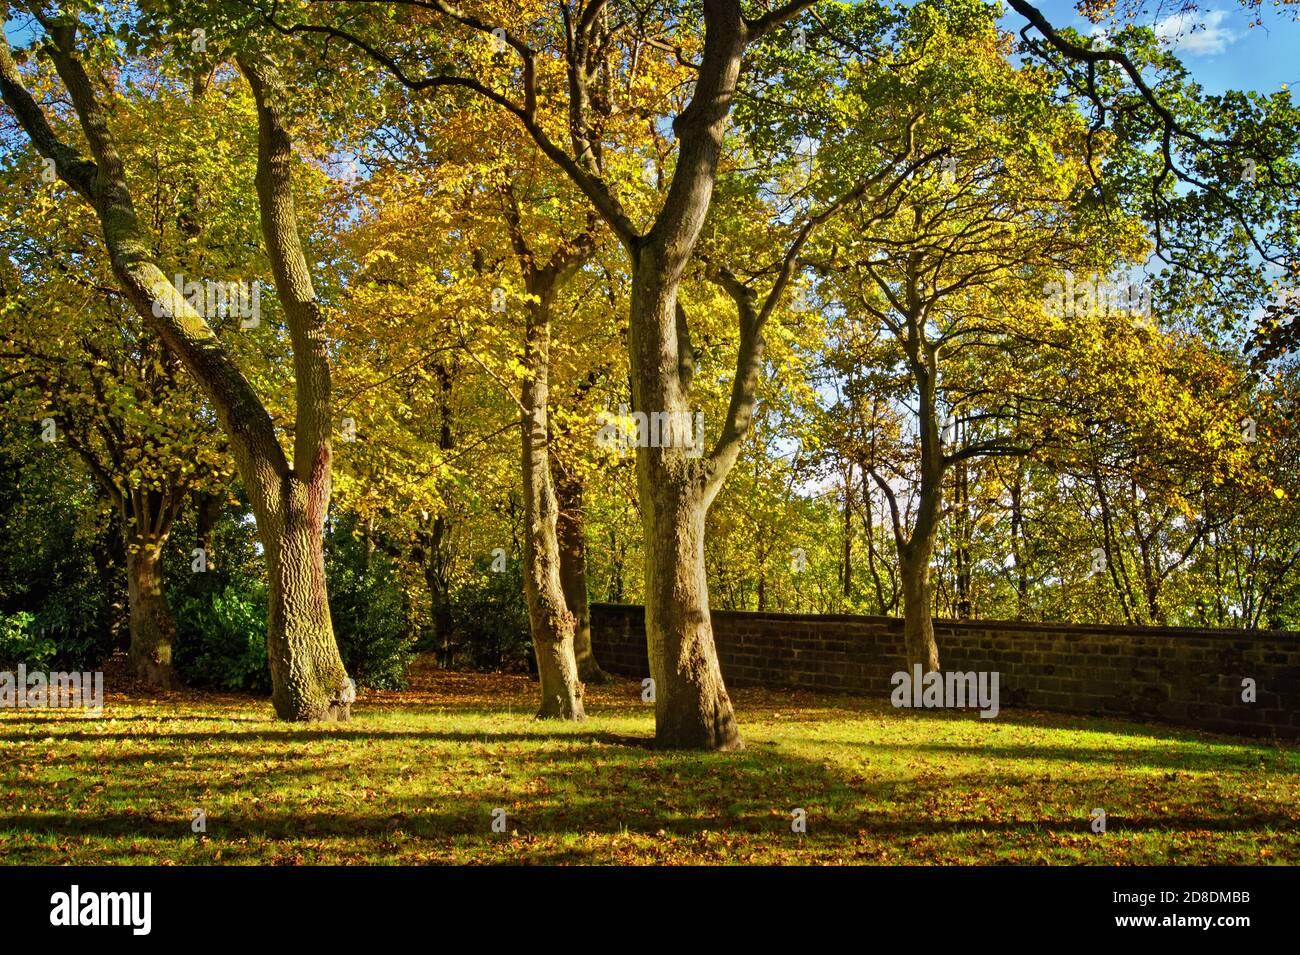 UK,South Yorkshire,Barnsley,Locke Park in Autumn Stock Photo